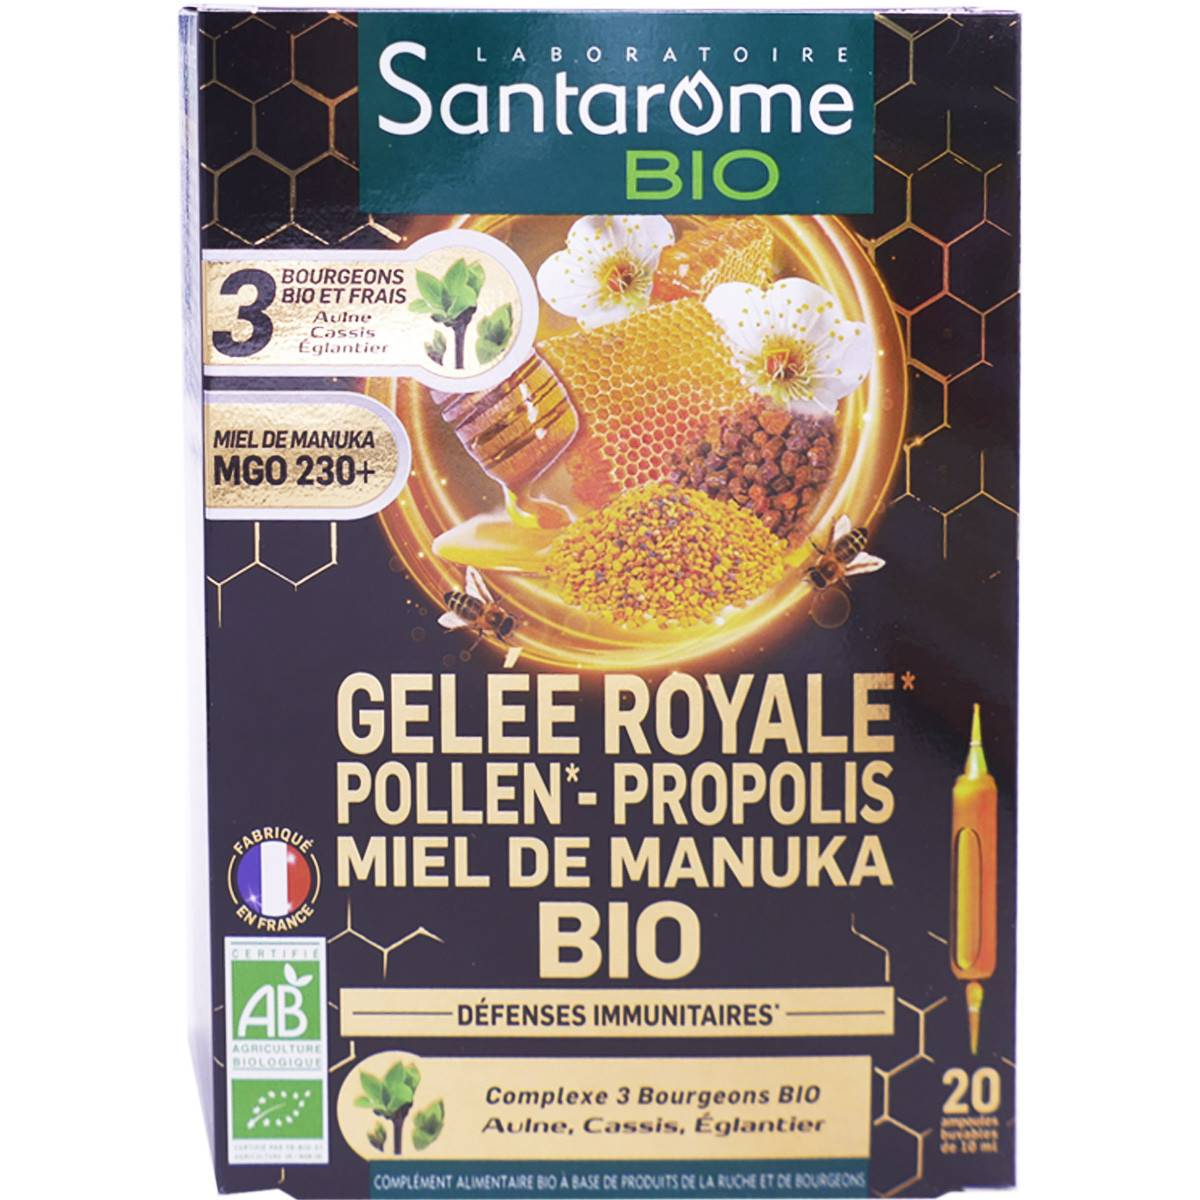 Santarome bio gelee royale pollen propolis miel de de manuka bio 20 ampoules